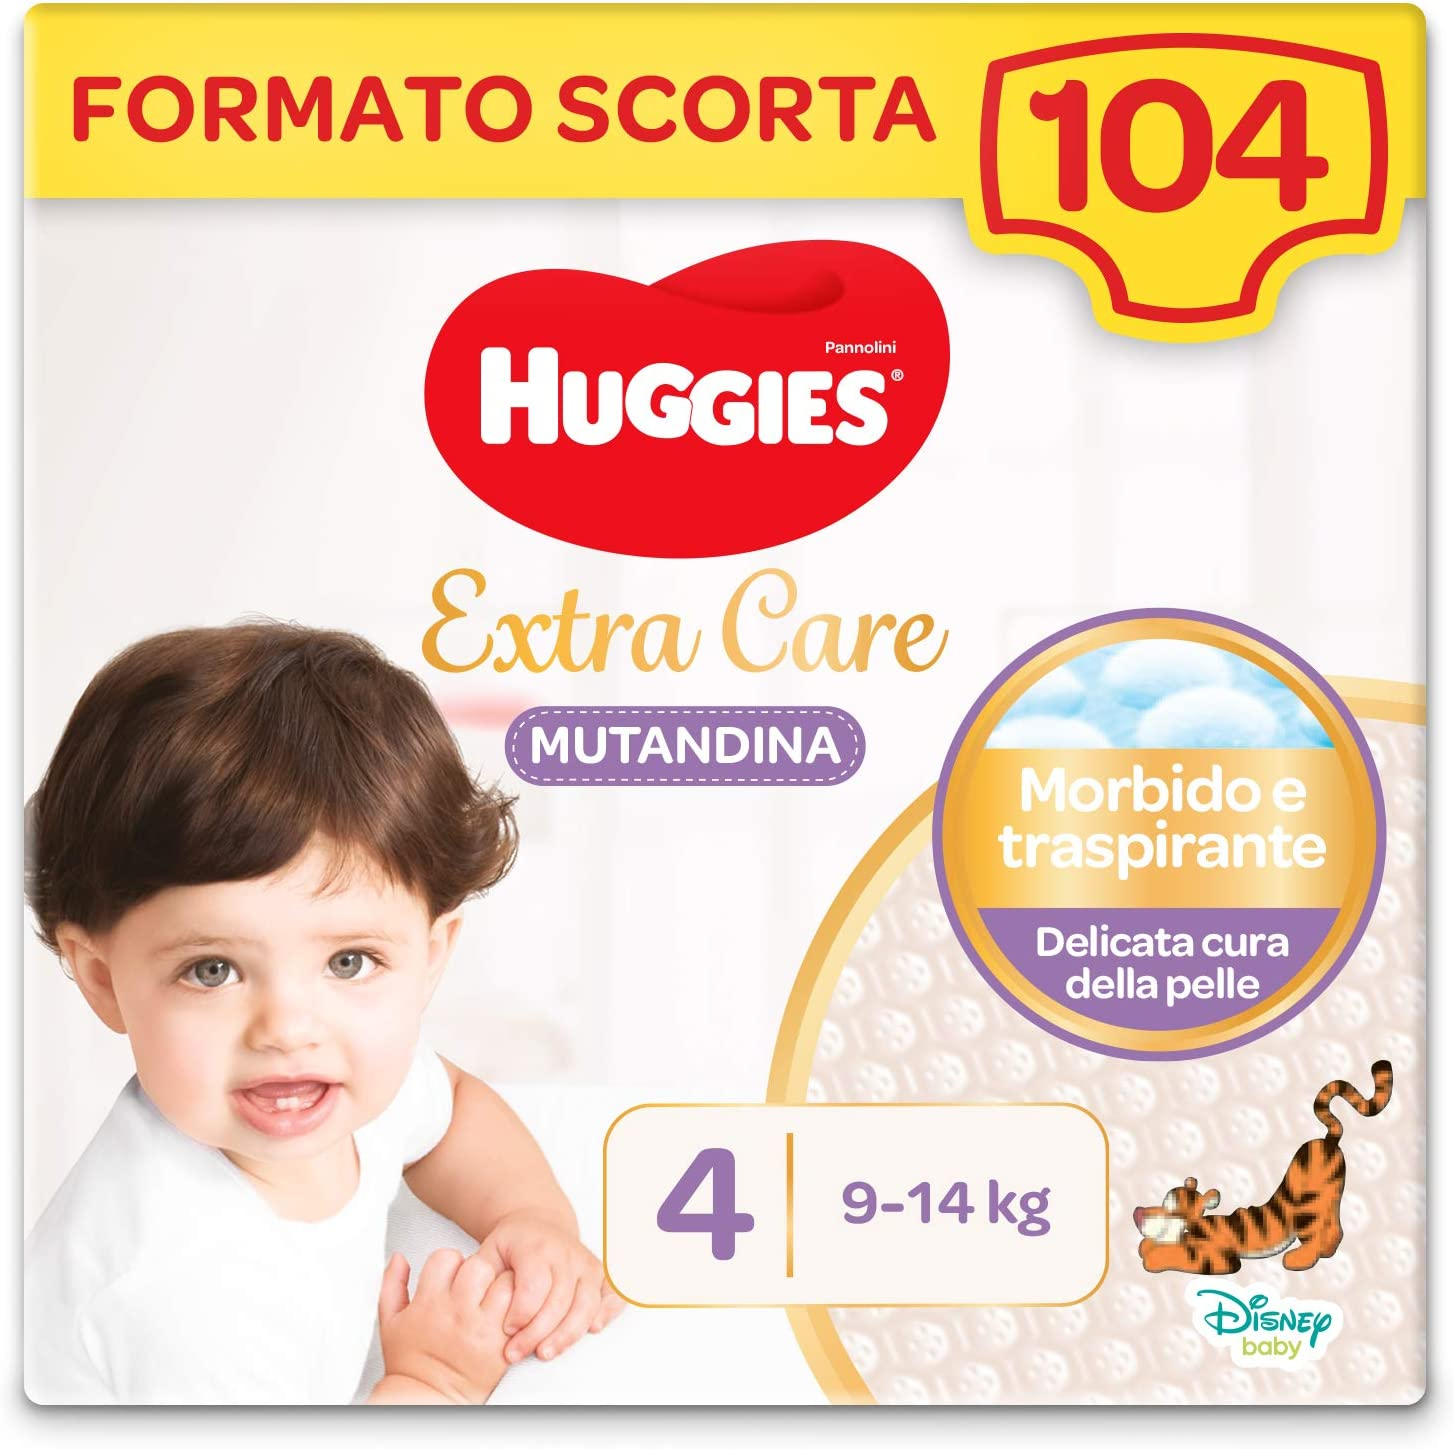 Huggies Pa/ñal braguita 12-17 kg 1 paquete de 34 unidades talla 5